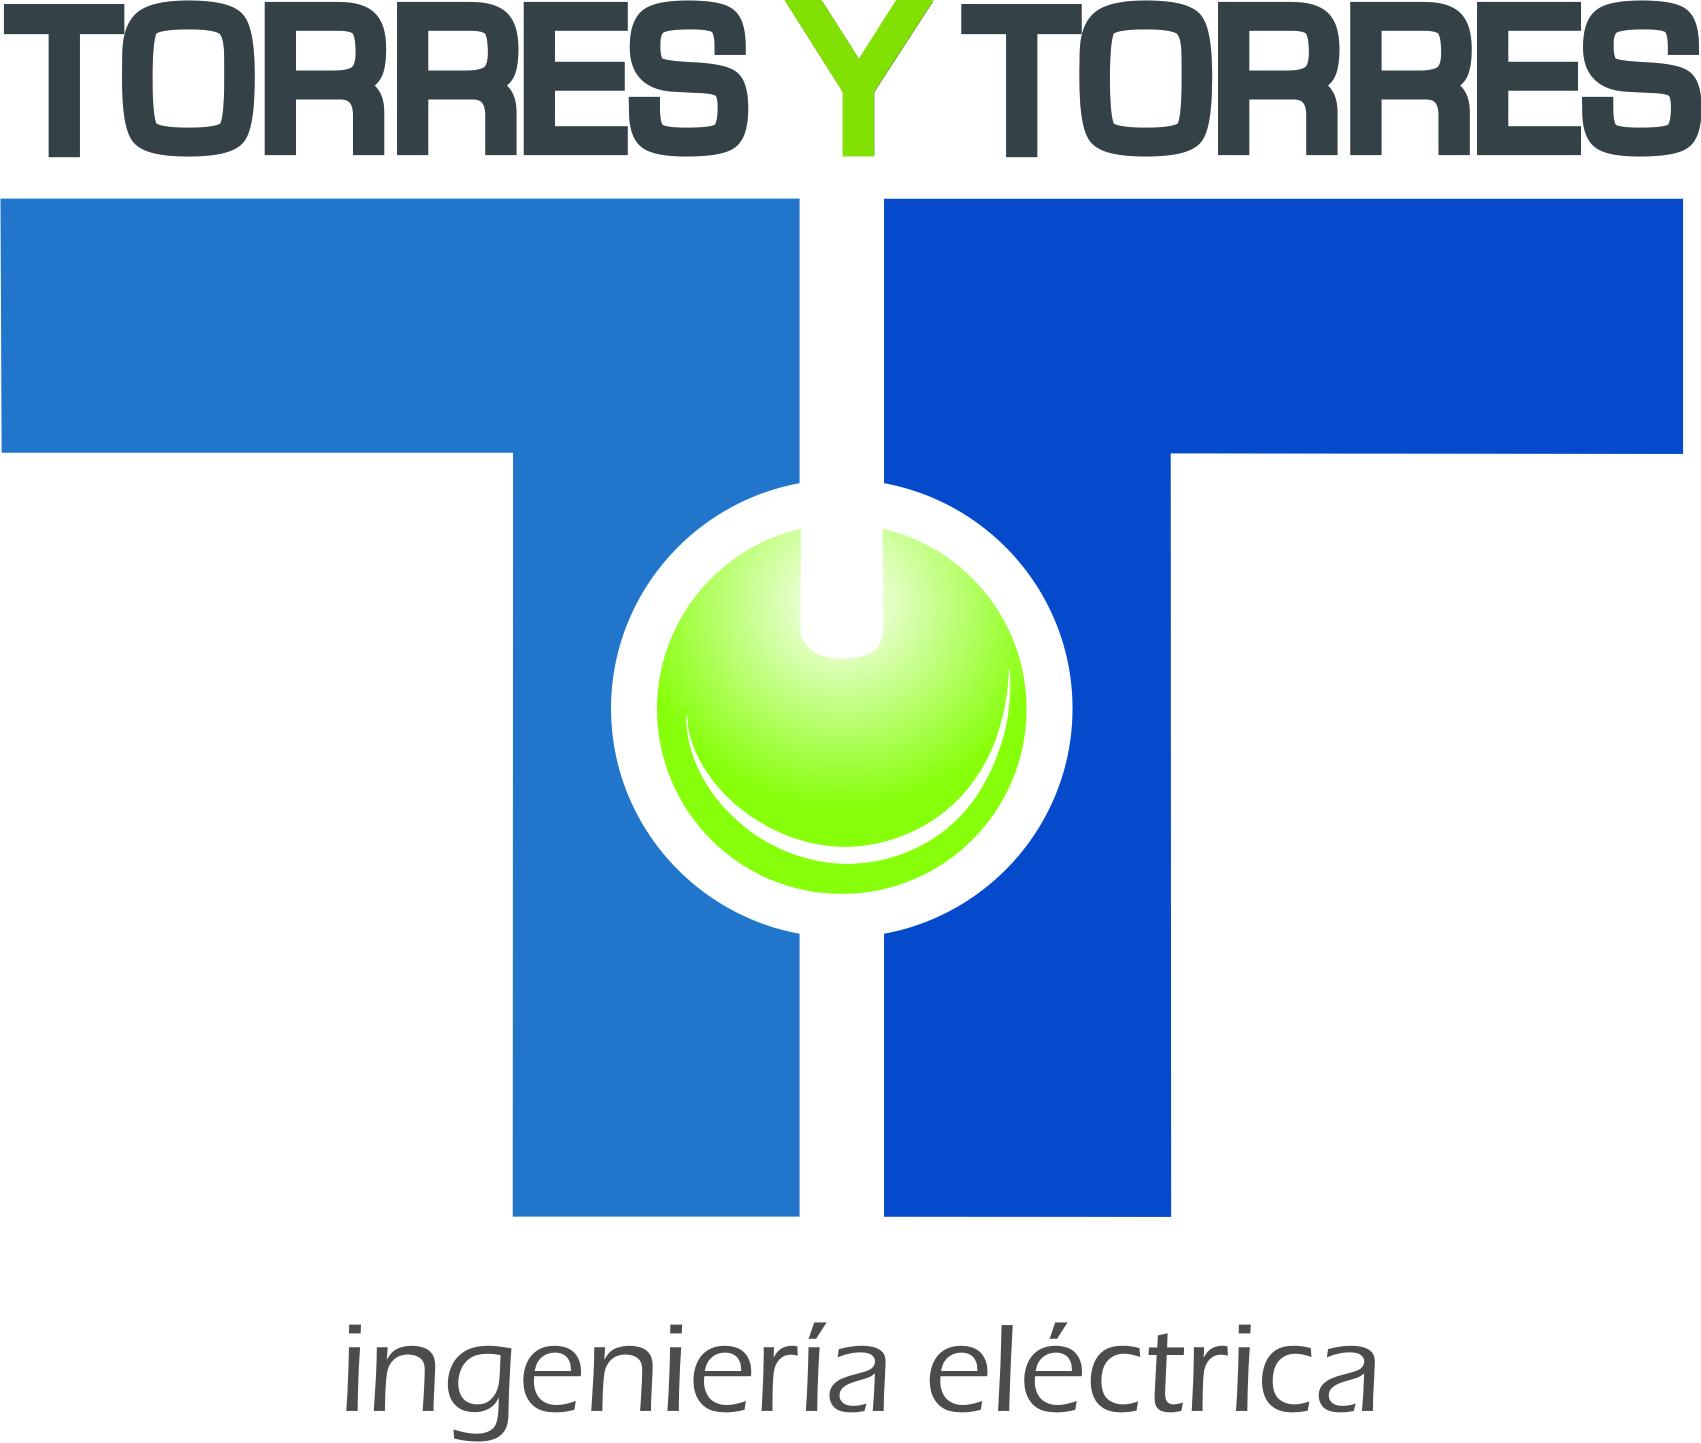 TORRES Y TORRES INGENIERIA ELECTRICA LTDA